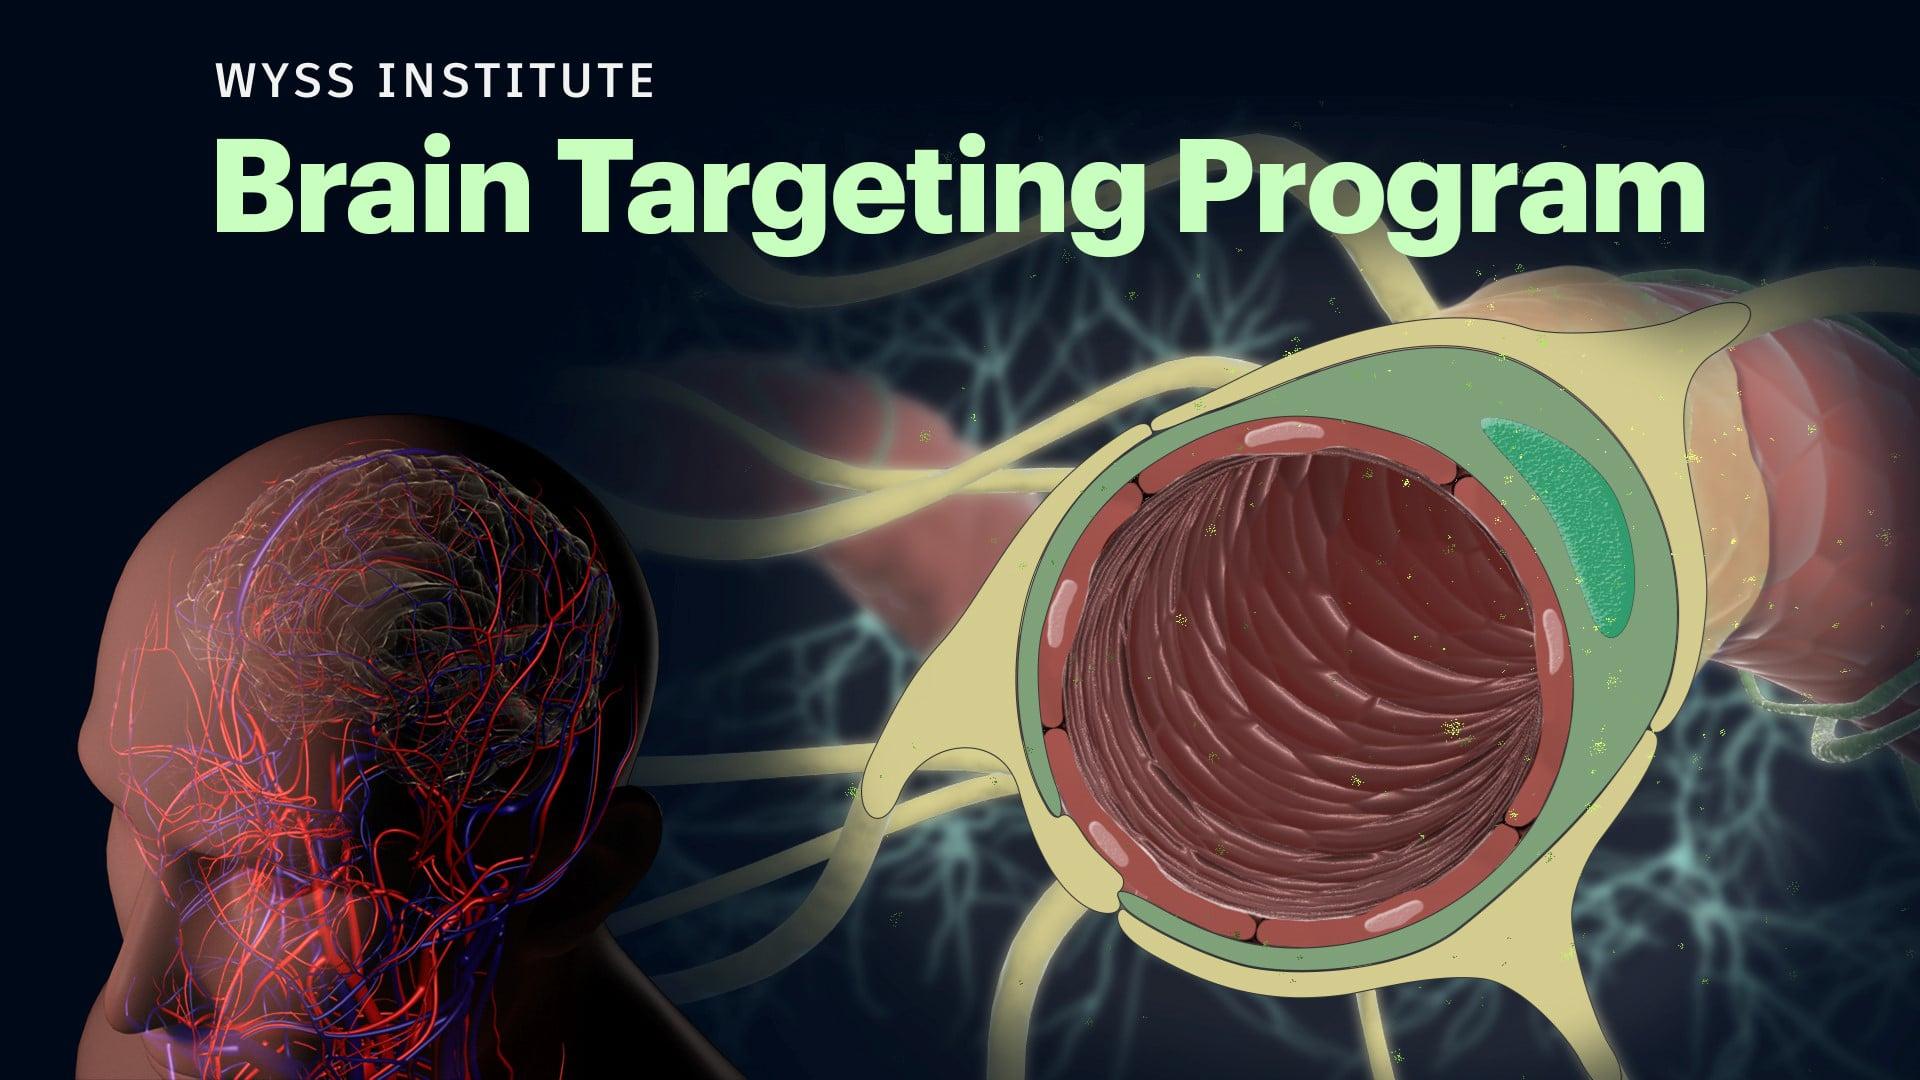 Wyss Institute Brain Targeting Program